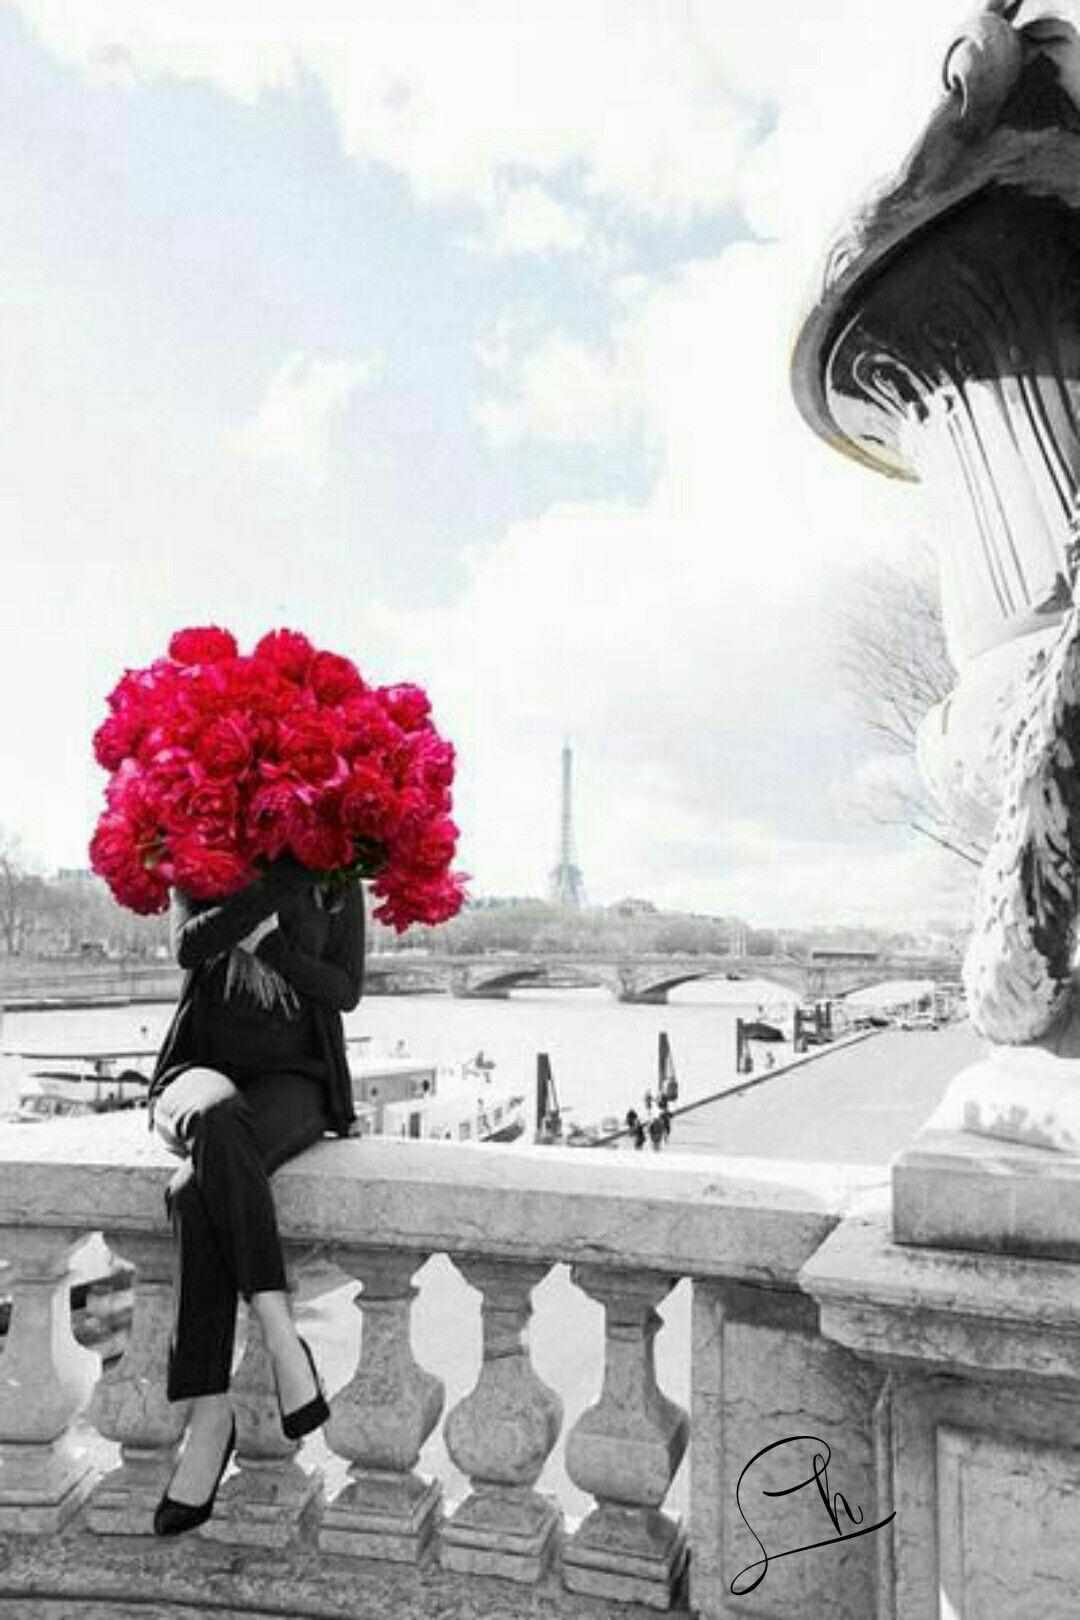 Pin De Mari Em Bom Dia Boa Fotos Rosas Arranjos De Flores